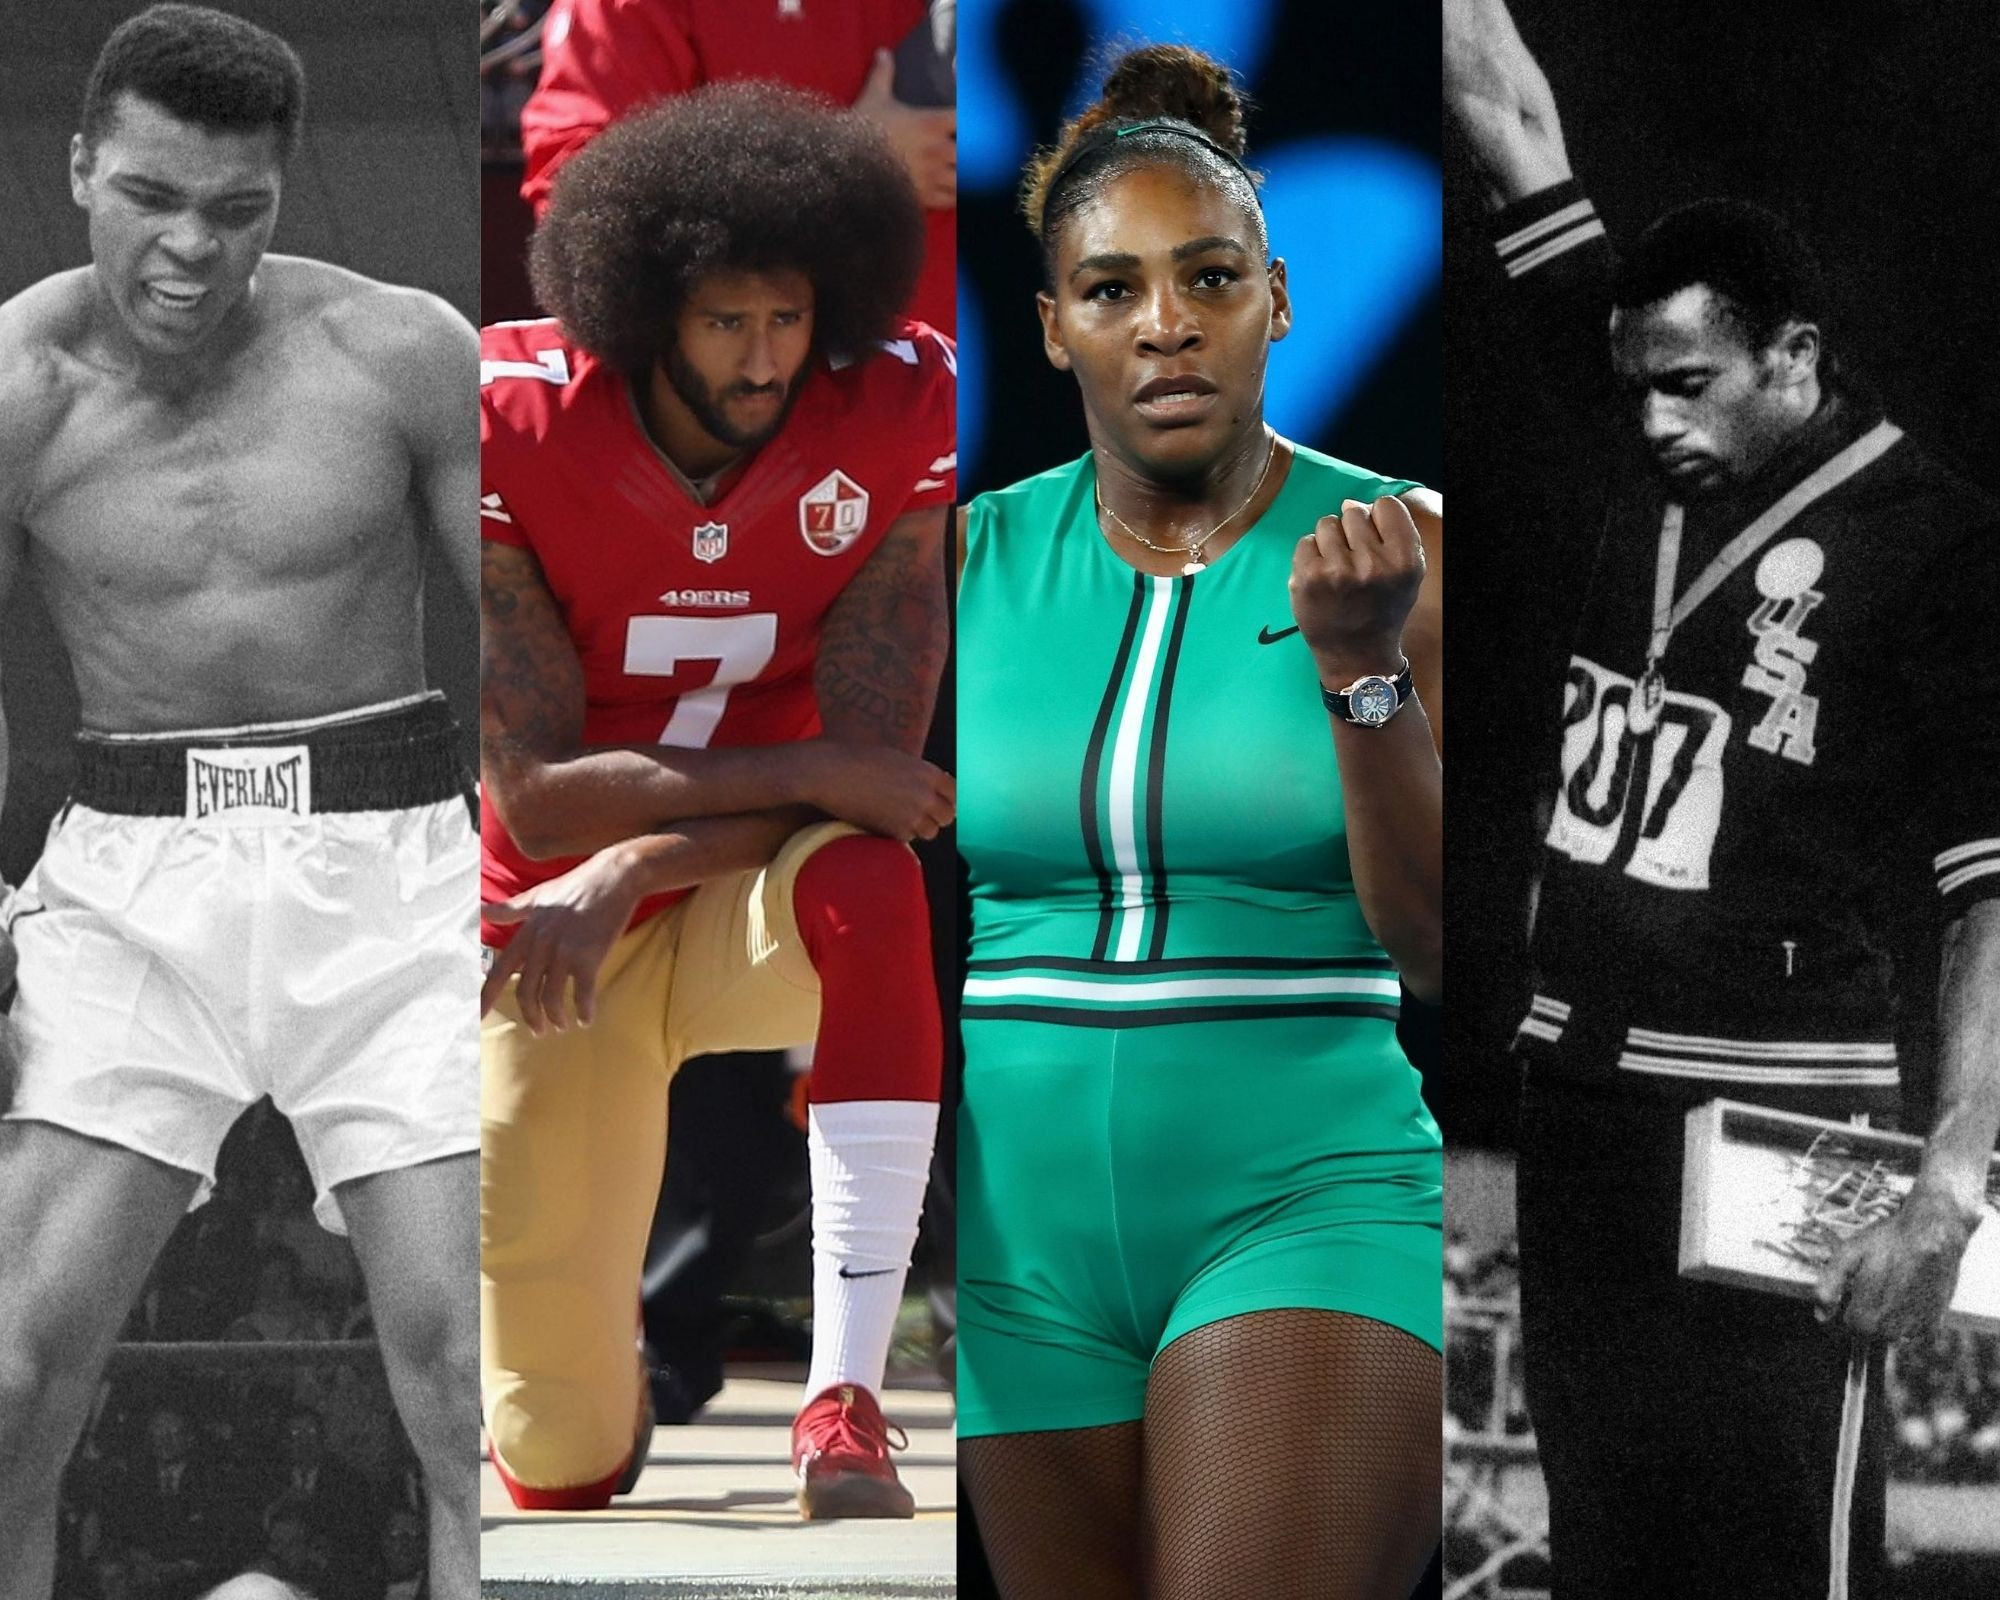 Muhammad Ali, Colin Kaepernick, Serena Williams, Tommie Smith